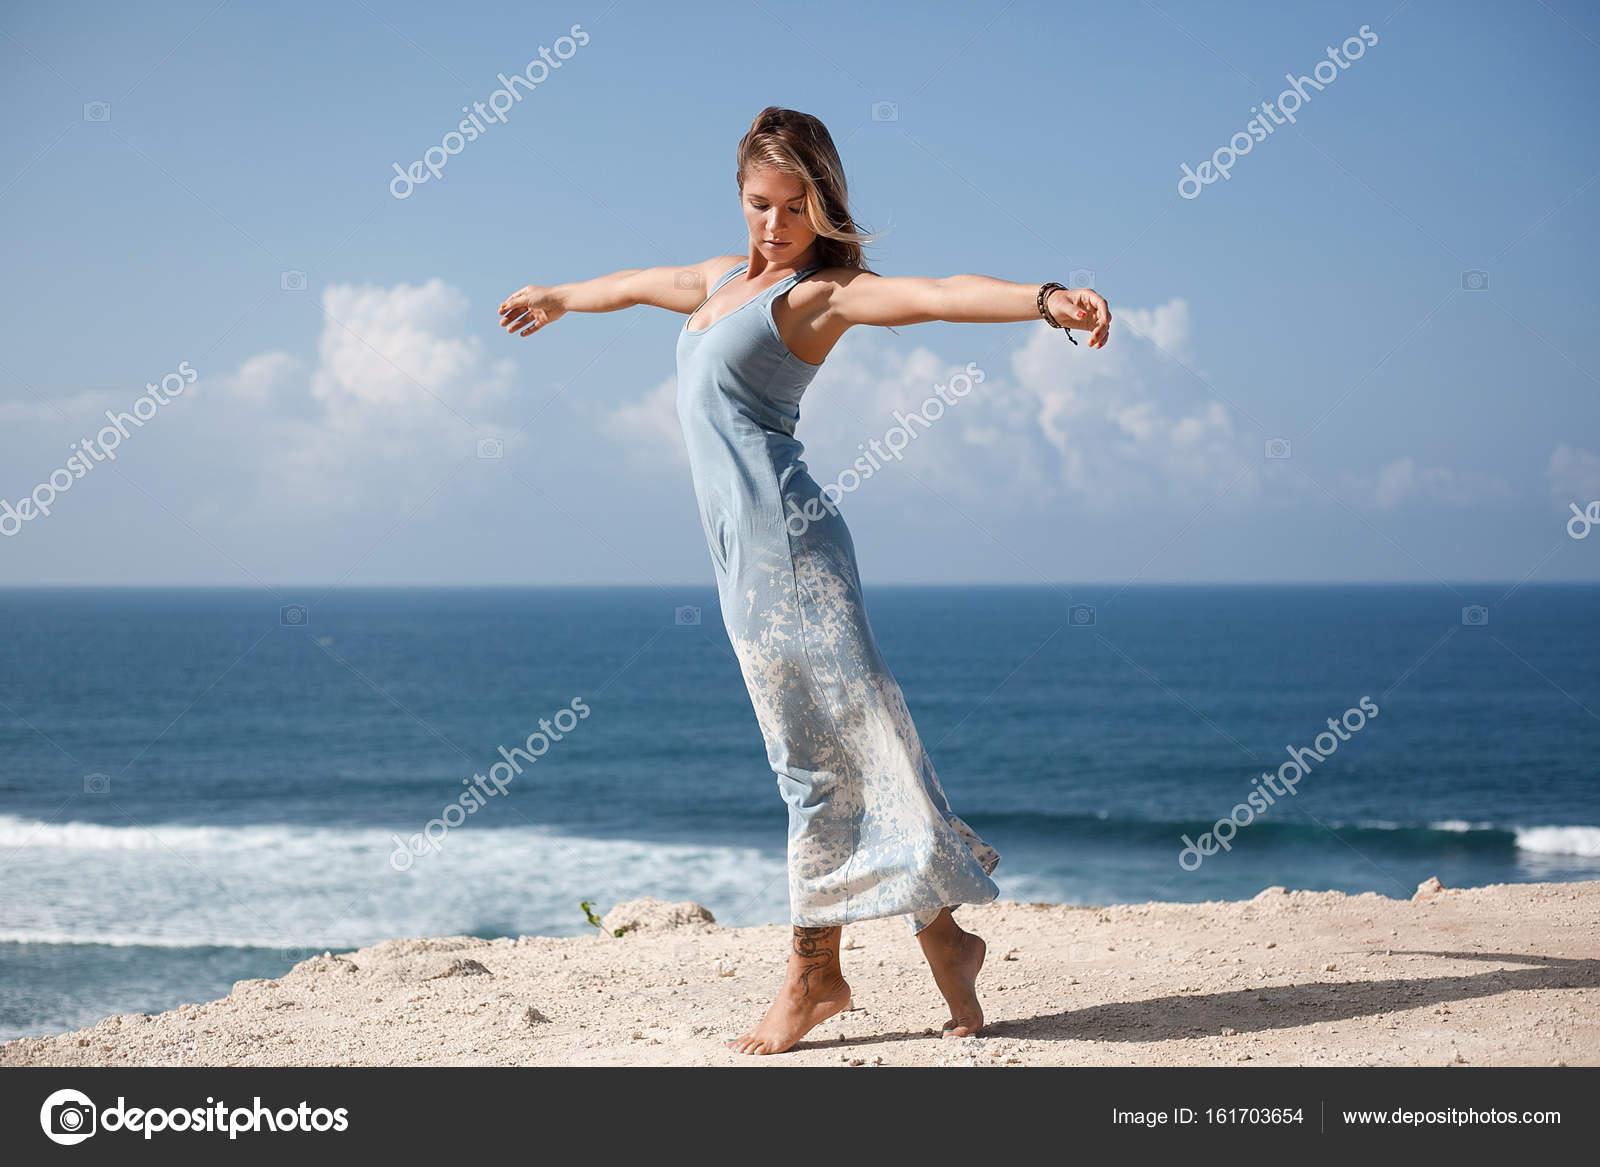 Licht Blauwe Jurk : Mooi meisje met haar zwevend in de lucht en de lichtblauwe jurk